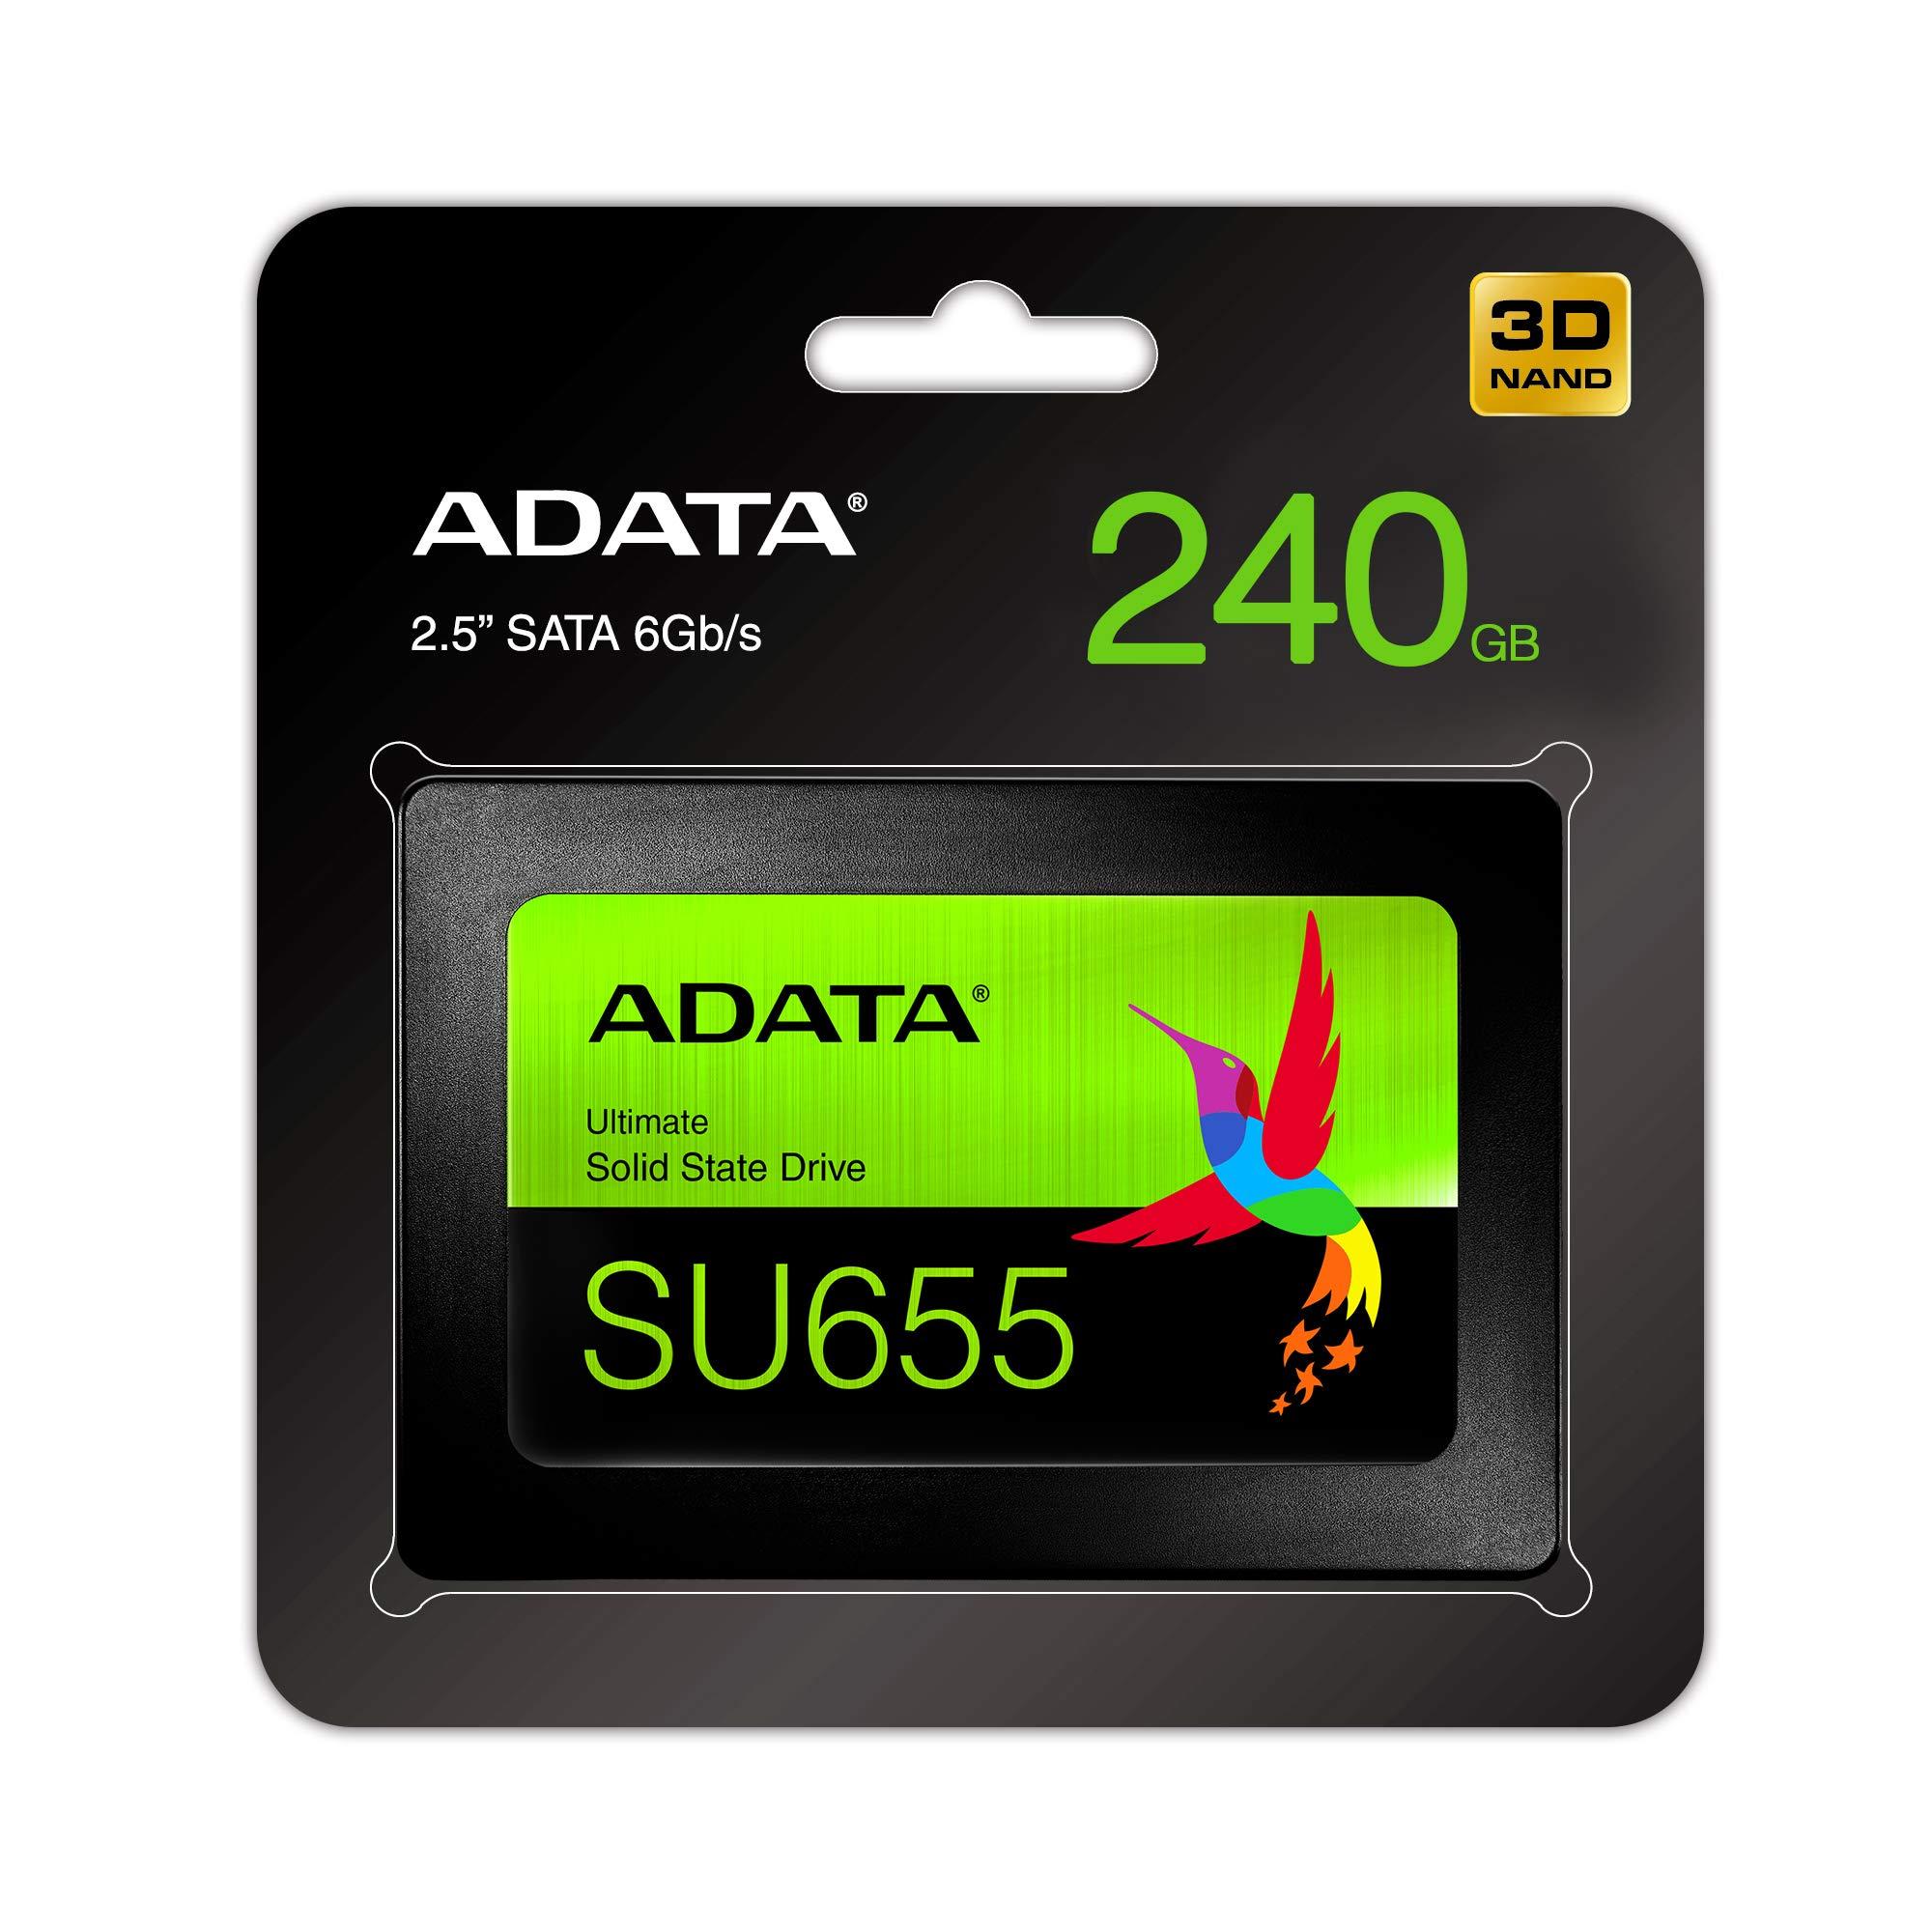 ADATA SU655 240GB 3D NAND 2.5 inch SATA III High Speed Read up to 520MB/s Internal SSD (ASU655SS-240GT-C) by ADATA (Image #4)